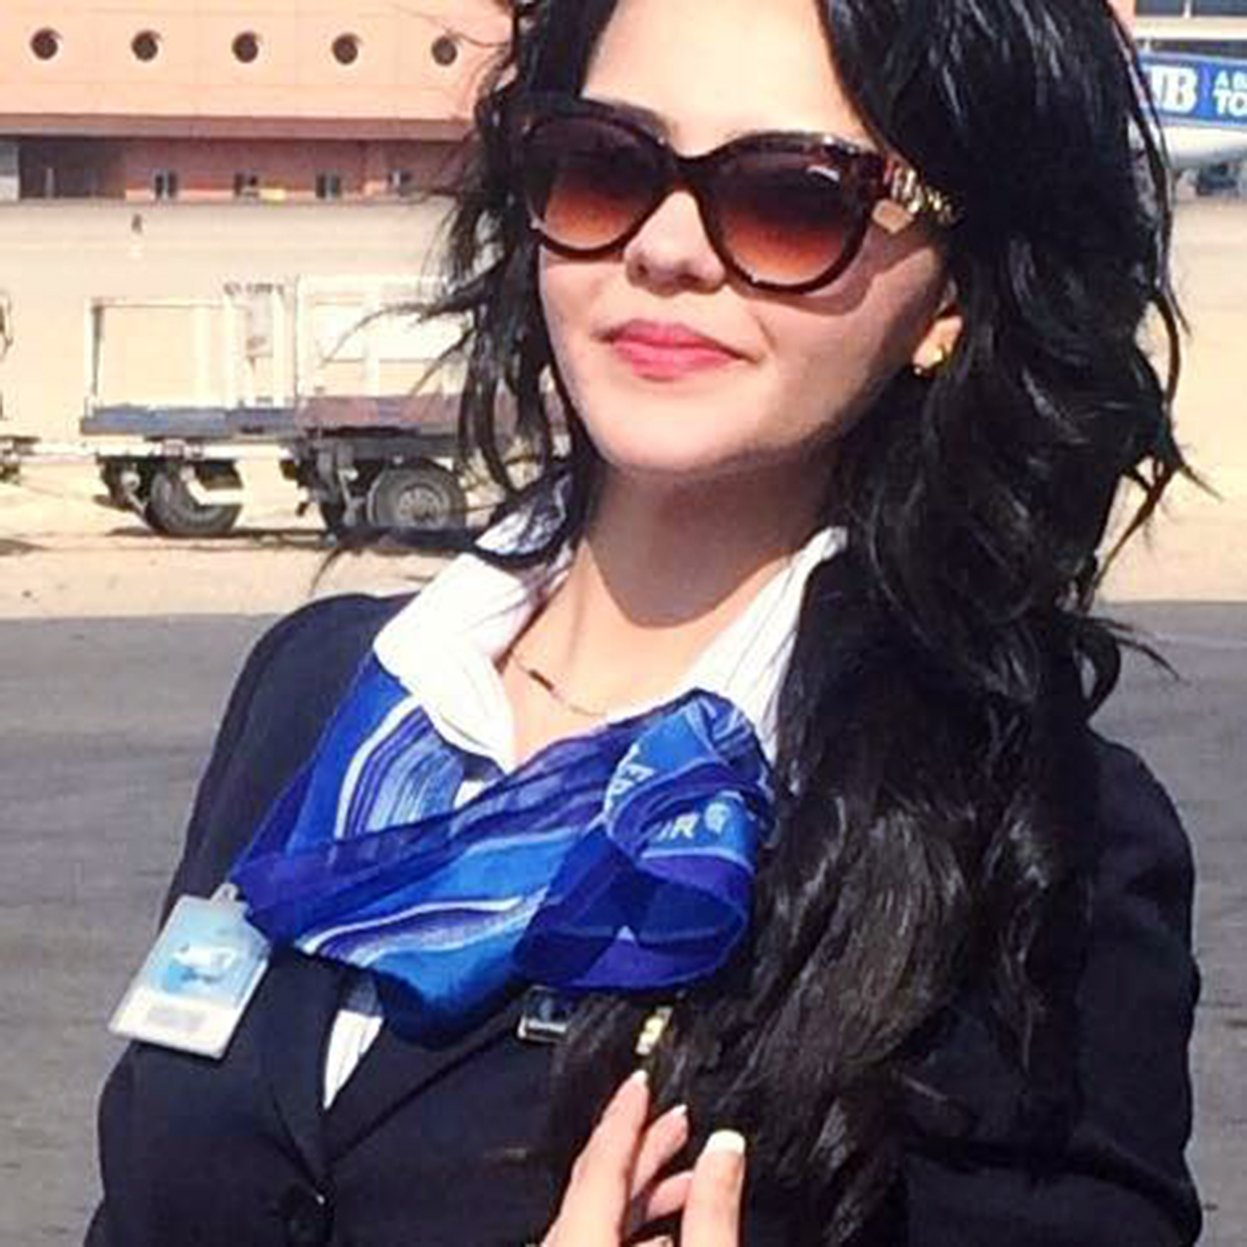 EgyptAir flight attendant posted pic of plane crashing